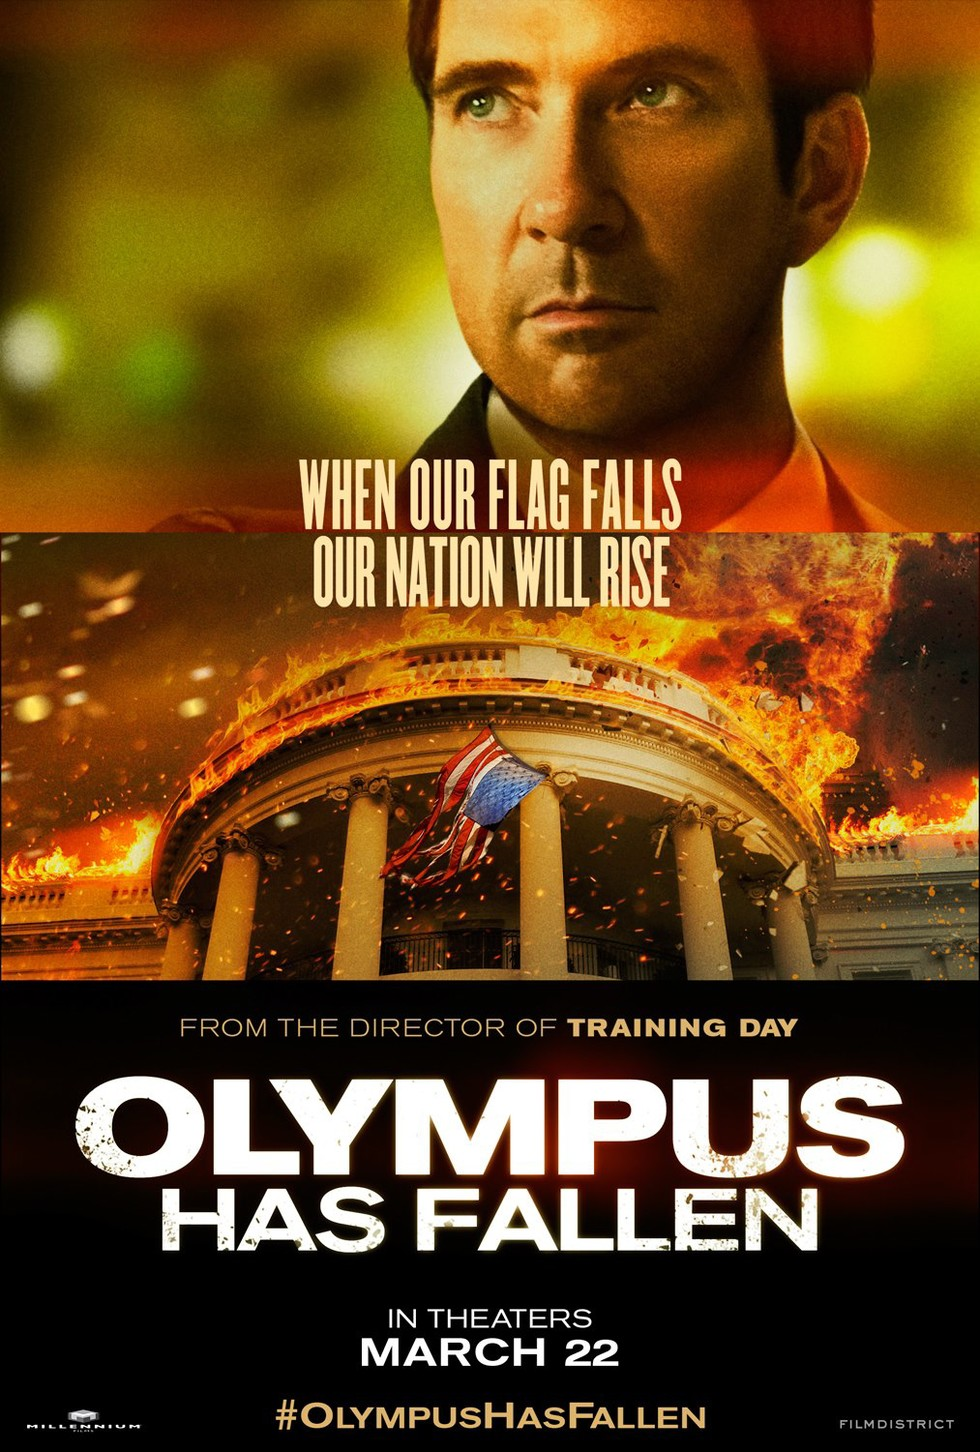 Olympus Has Fallen - Movie Poster #5 (Large)